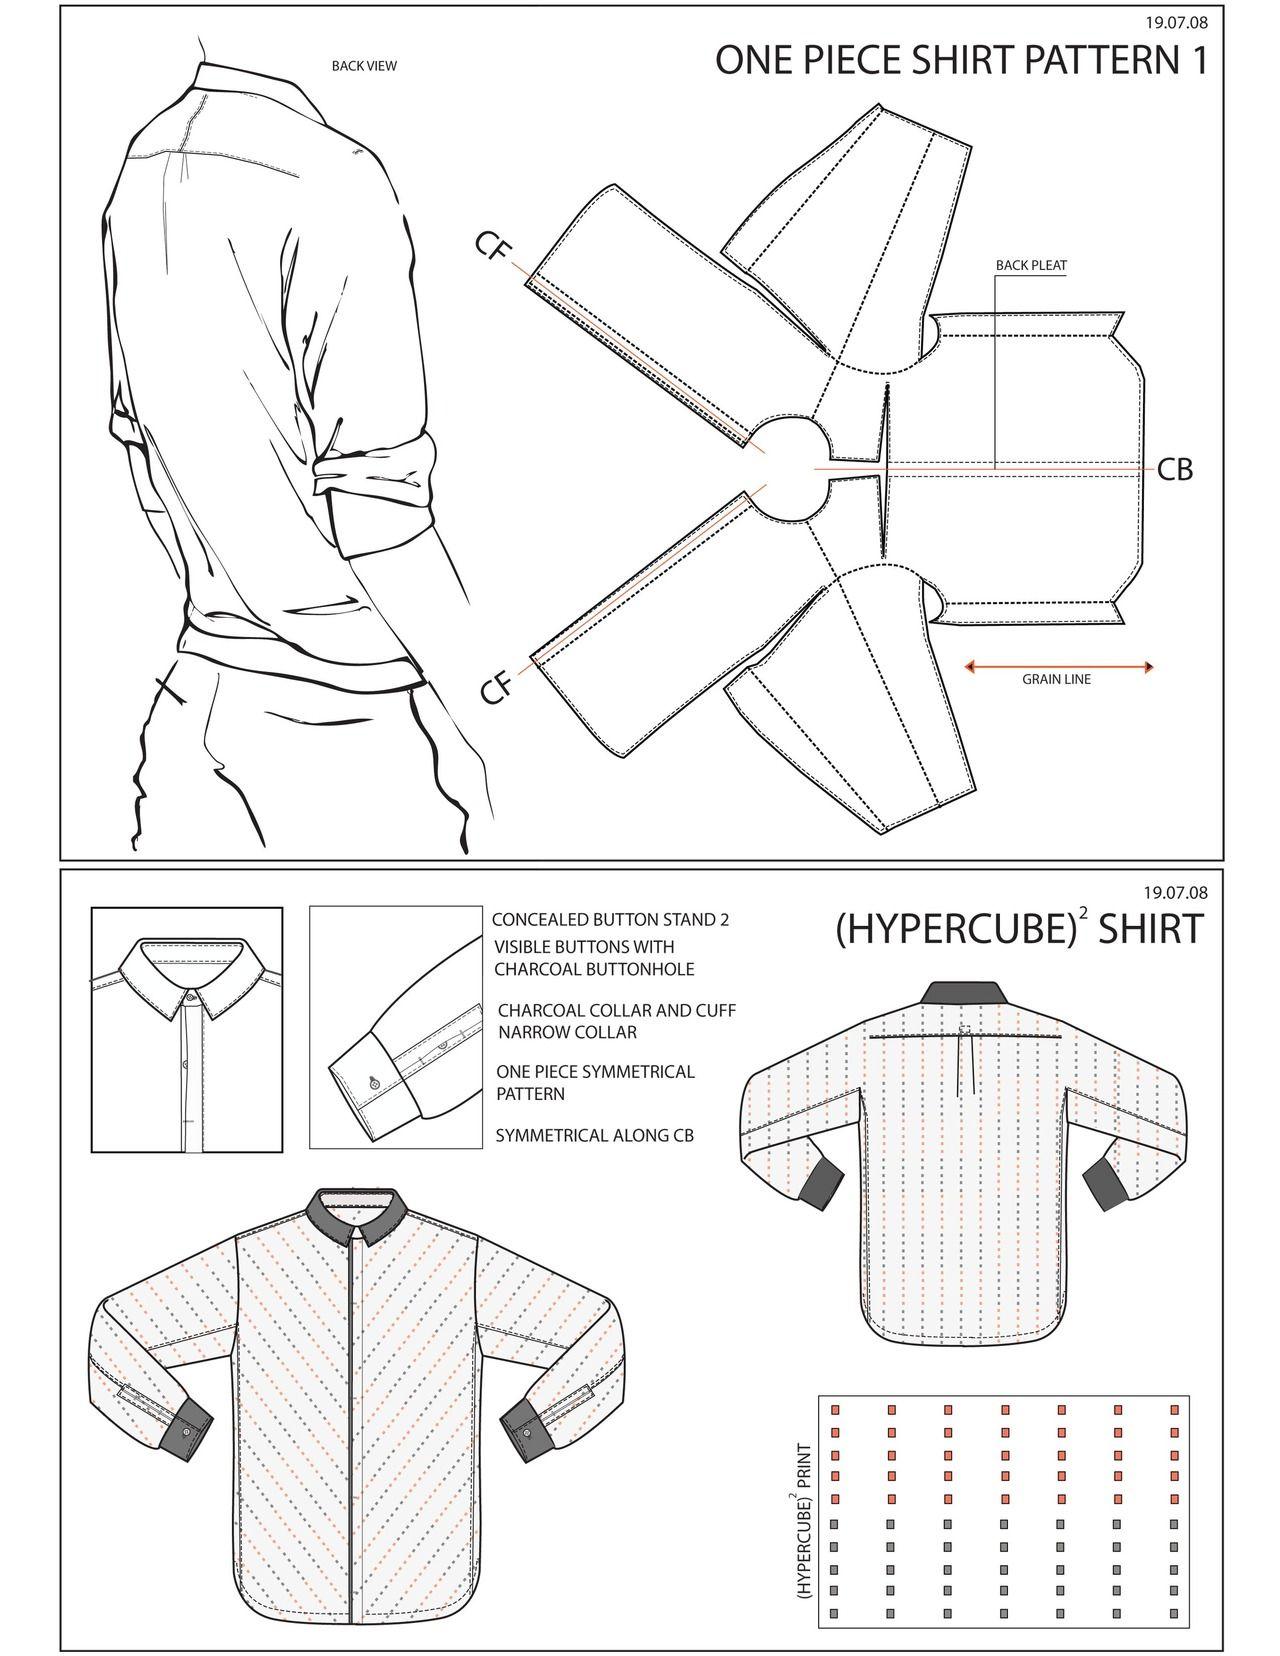 One Piece Shirt Experimental Pattern Cutting Pattern